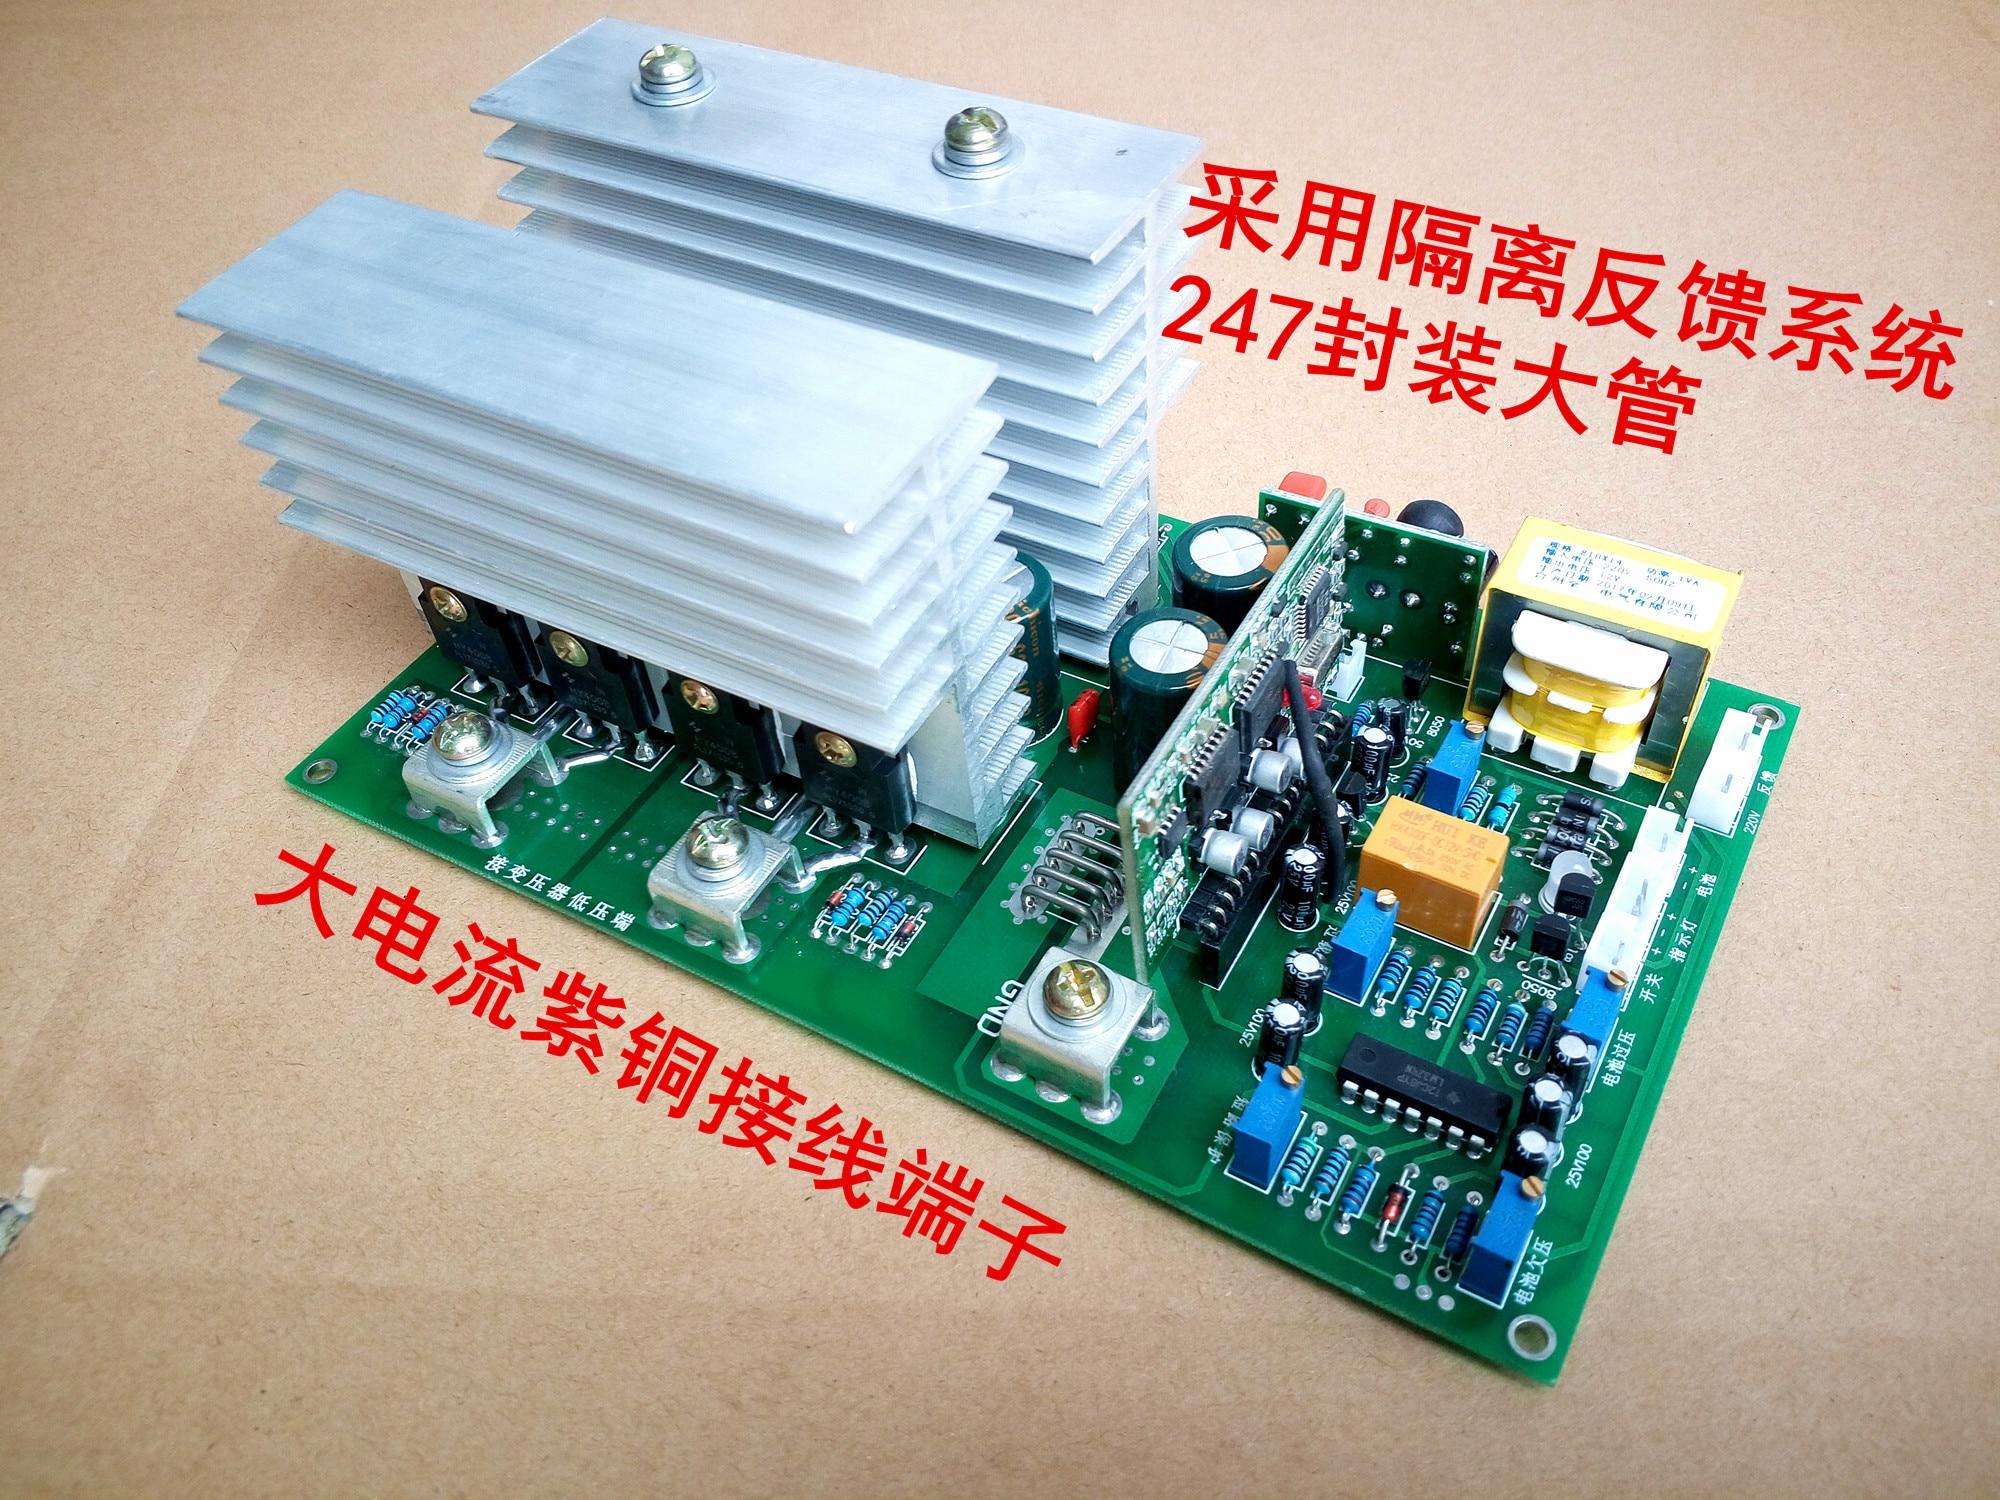 24v 36v 48v 60v 1kw To 5kw Pure Sine Wave Power Frequency Inverter How Make A Homemade 2000 Va Circuit Electronic The Latest High Main Board 12v24v36v48v60v